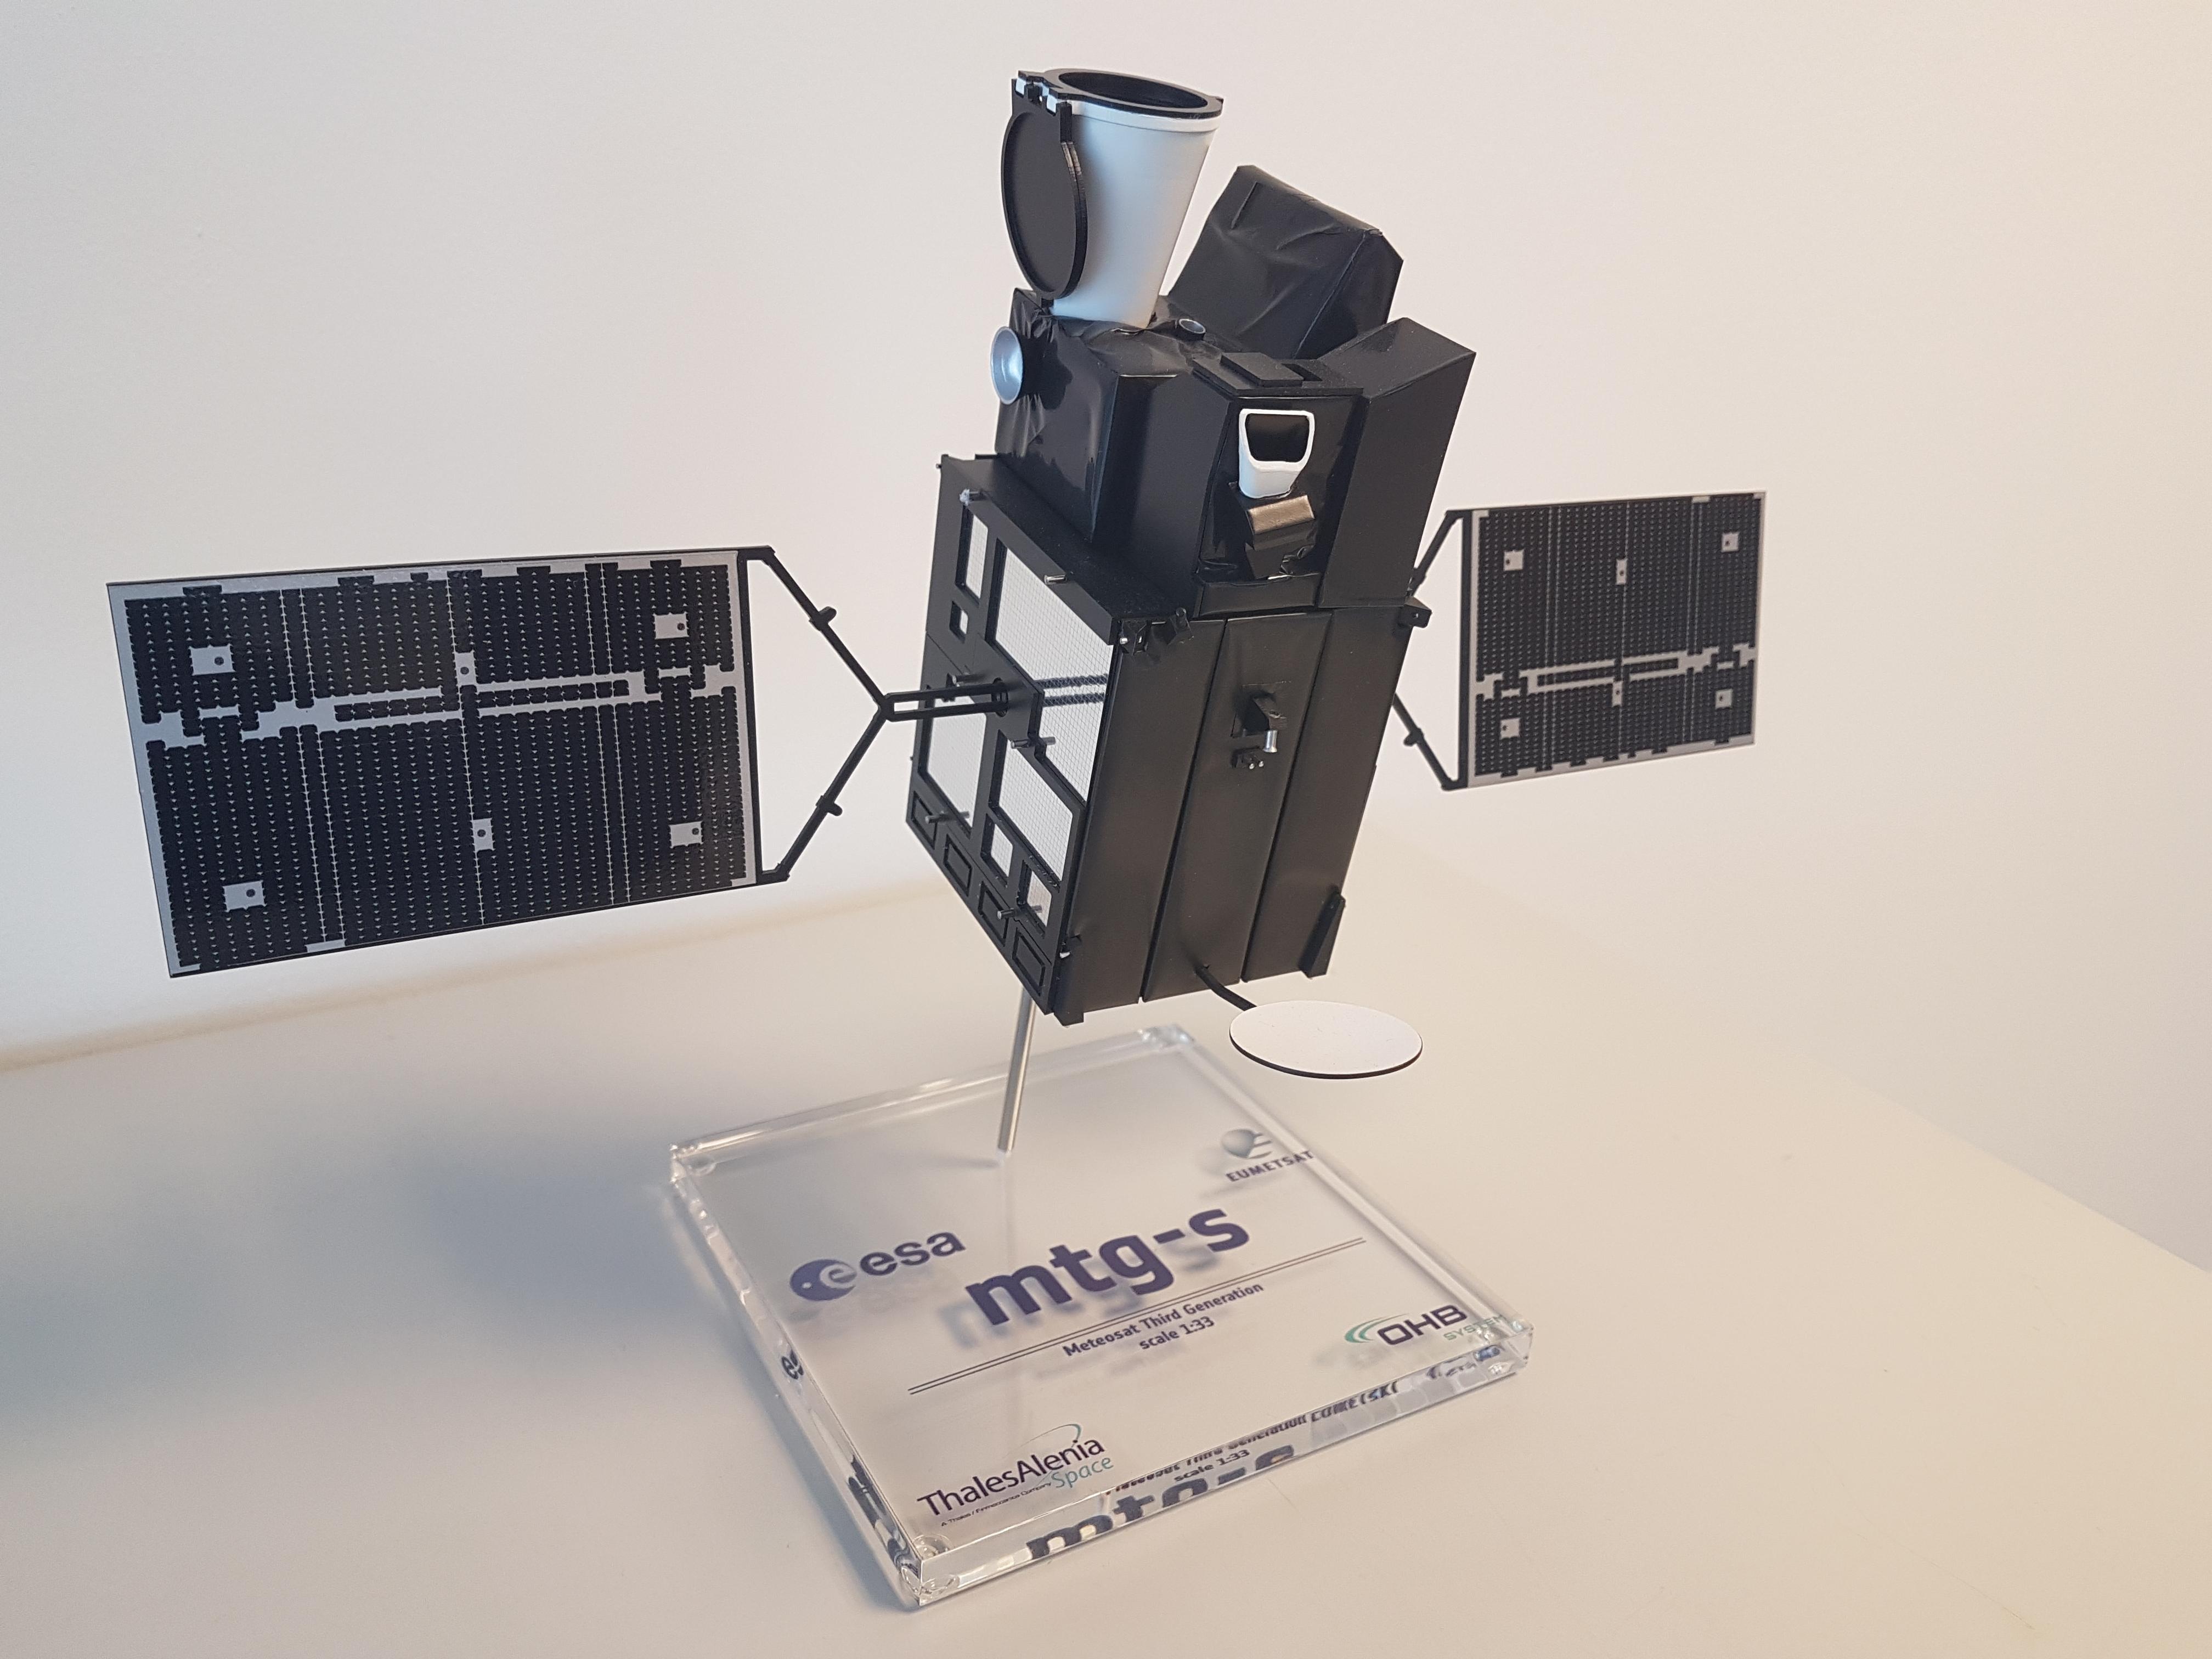 MTG-S 1:33 space satellite model eumetsat